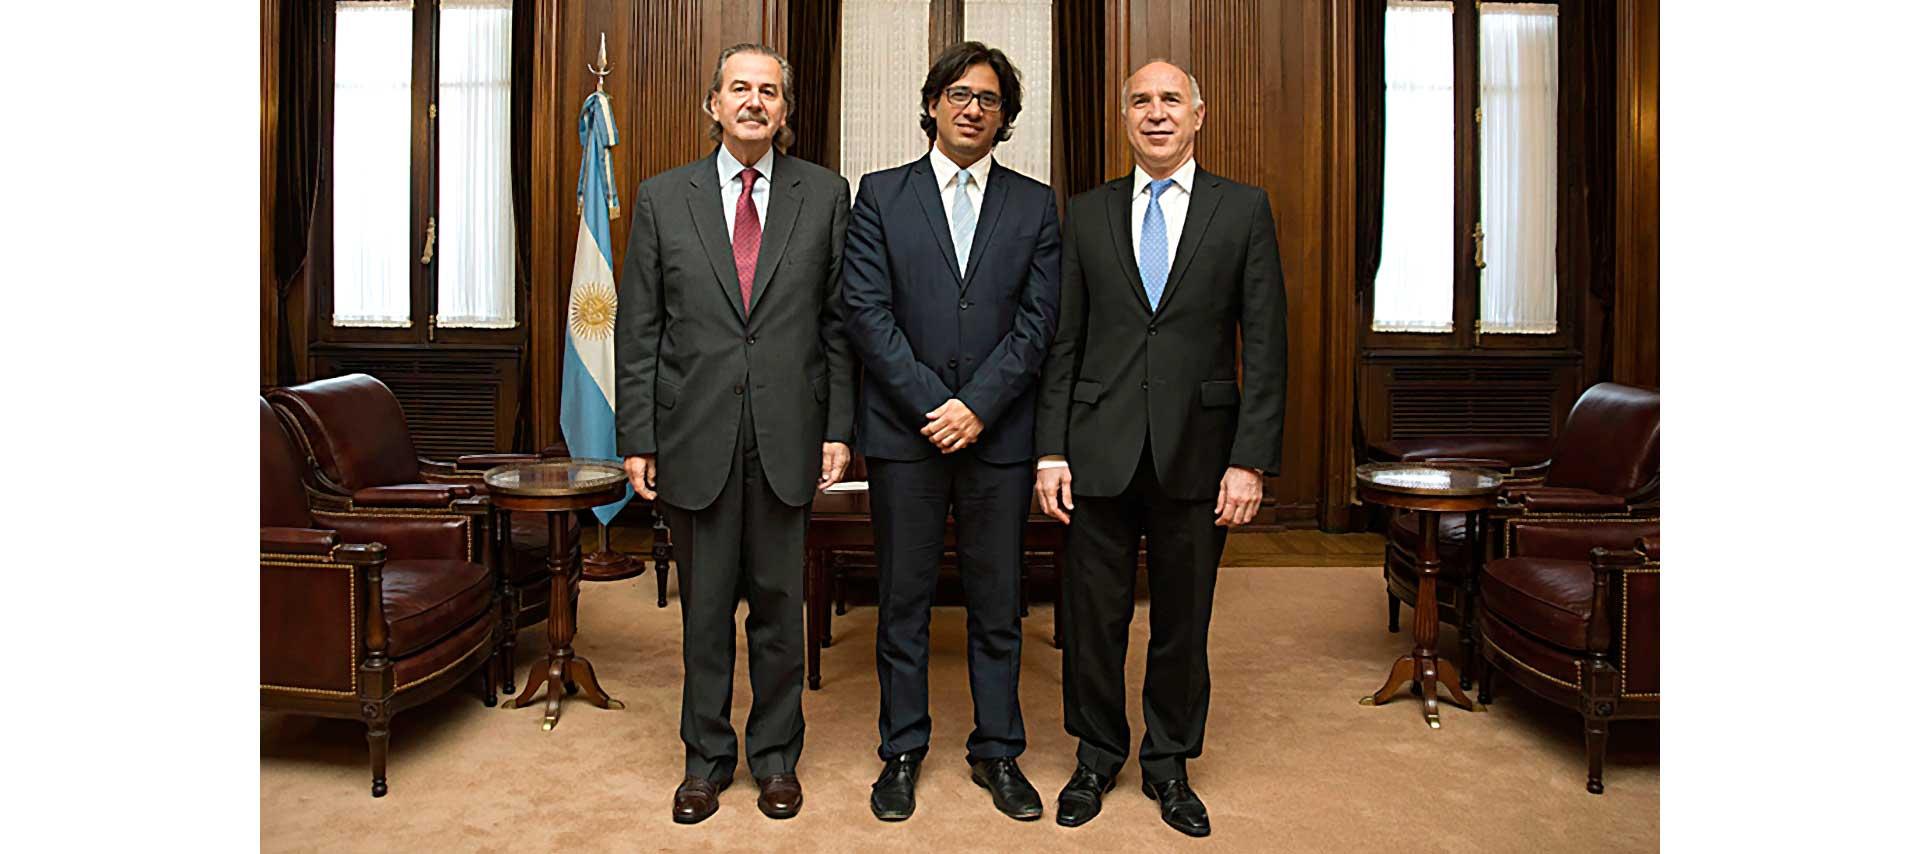 Traspaso_presidencial_4_caja